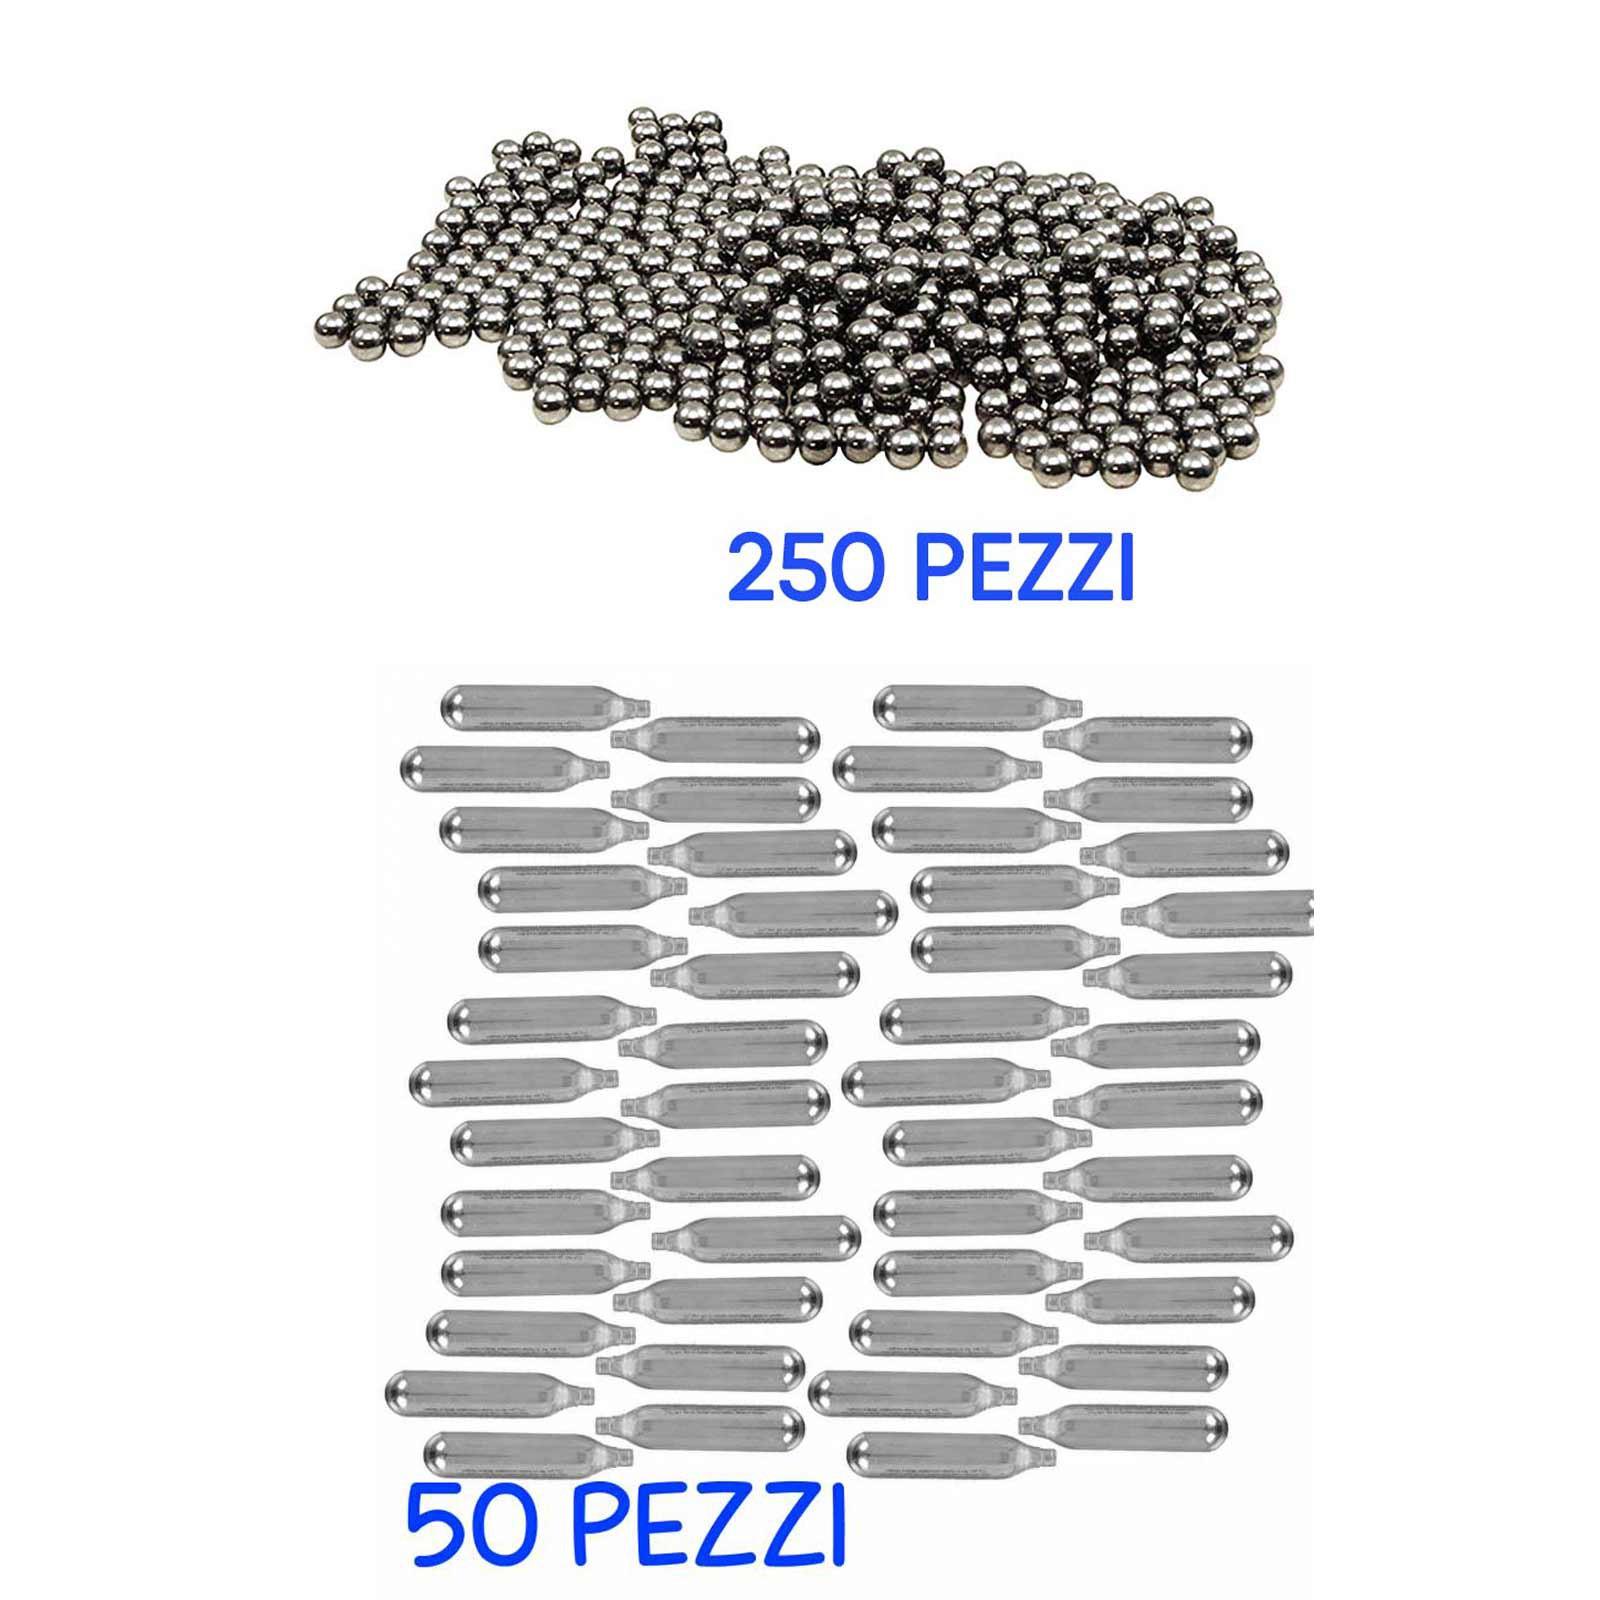 Kit Softair Gioco 50 Bombolette Ricarica CO2 250 Pallini Metallo 6 mm Lucidate